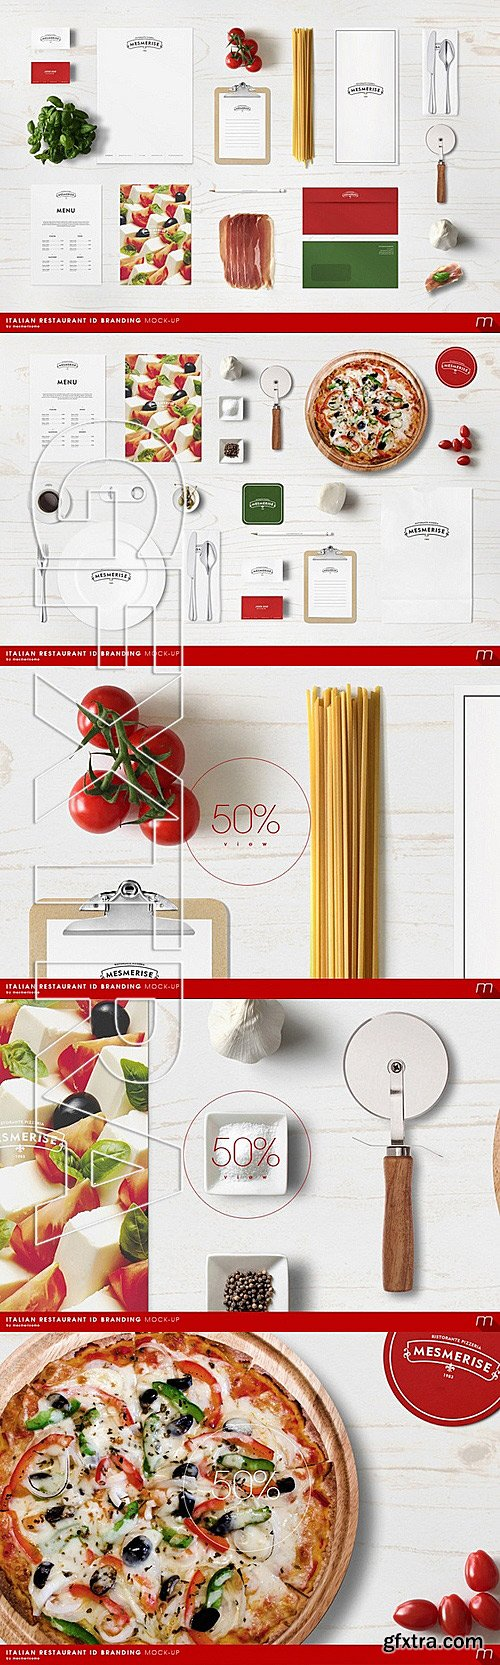 CM - Italian Restaurant Identity Mock-up 333380